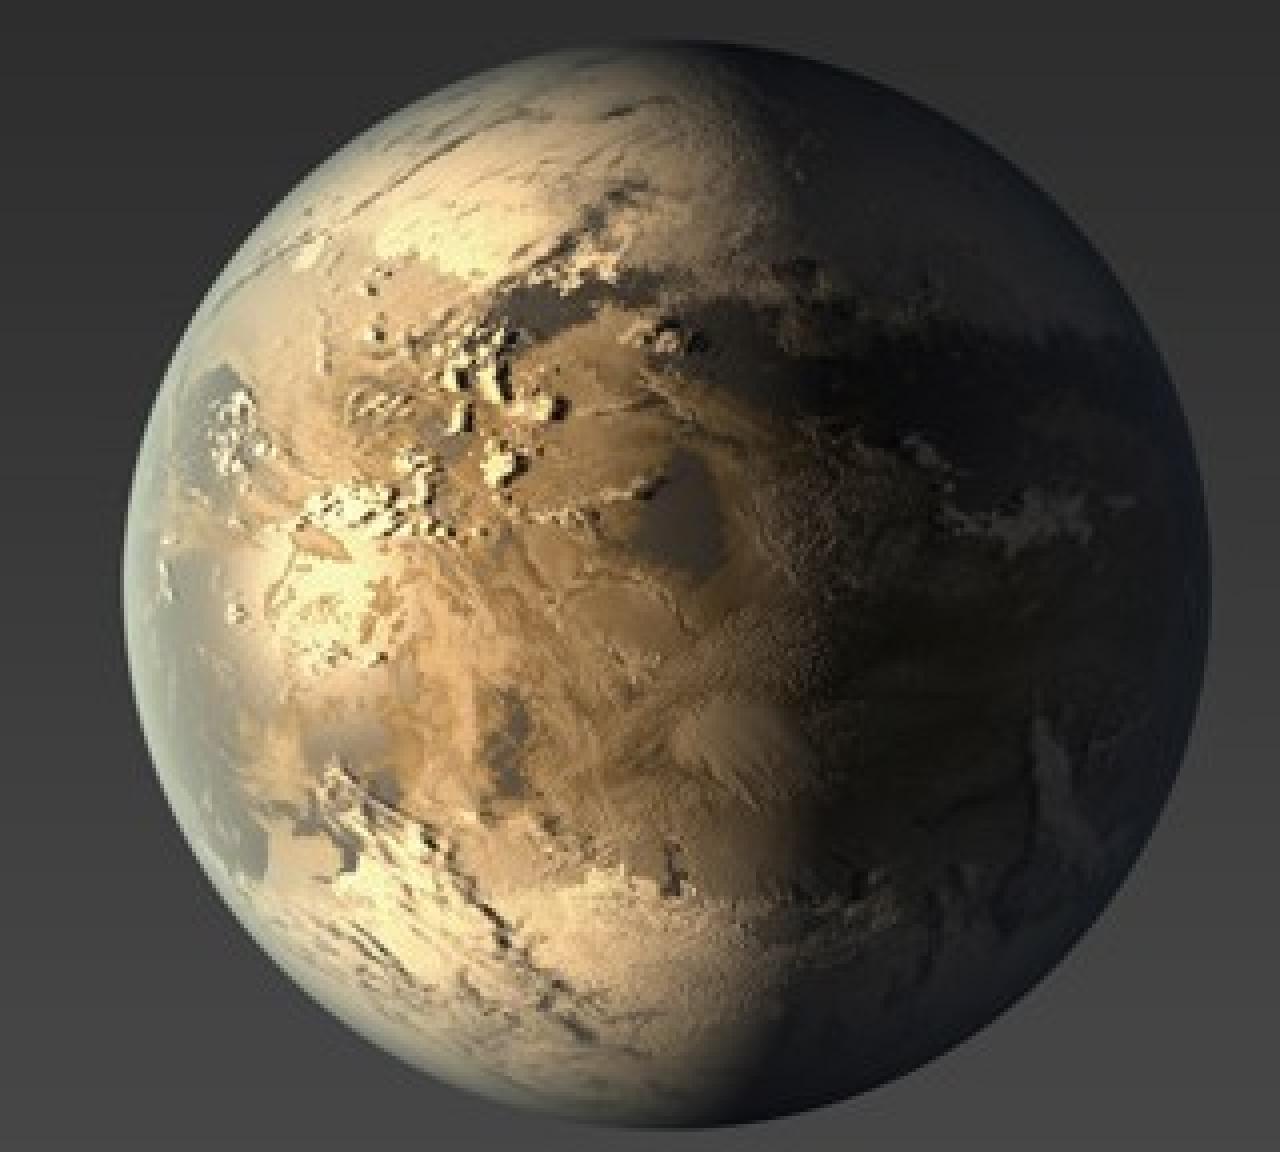 Kepler 62f Los cinco planetas a l...